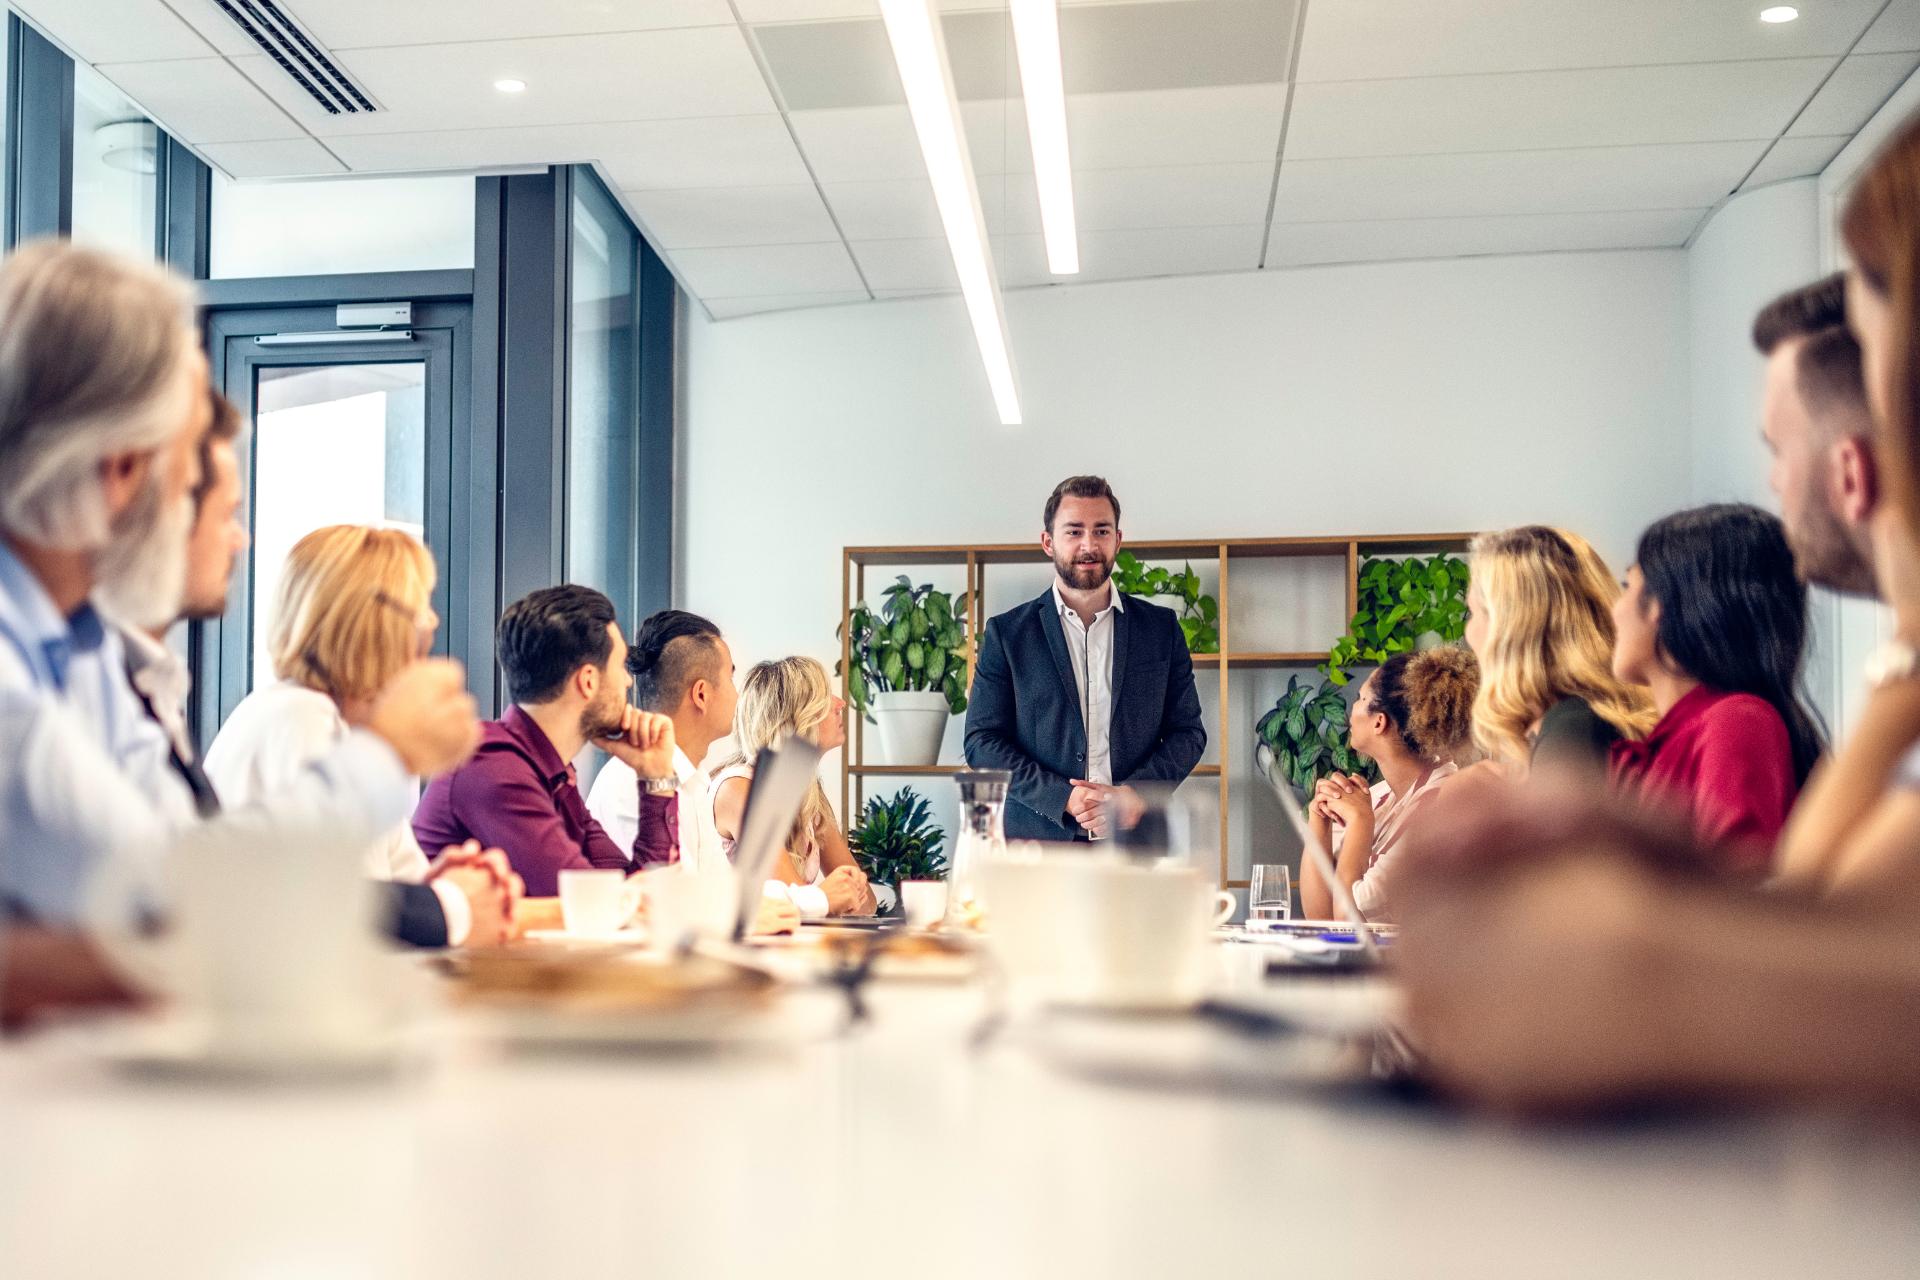 Legisway Corporate Entity Management